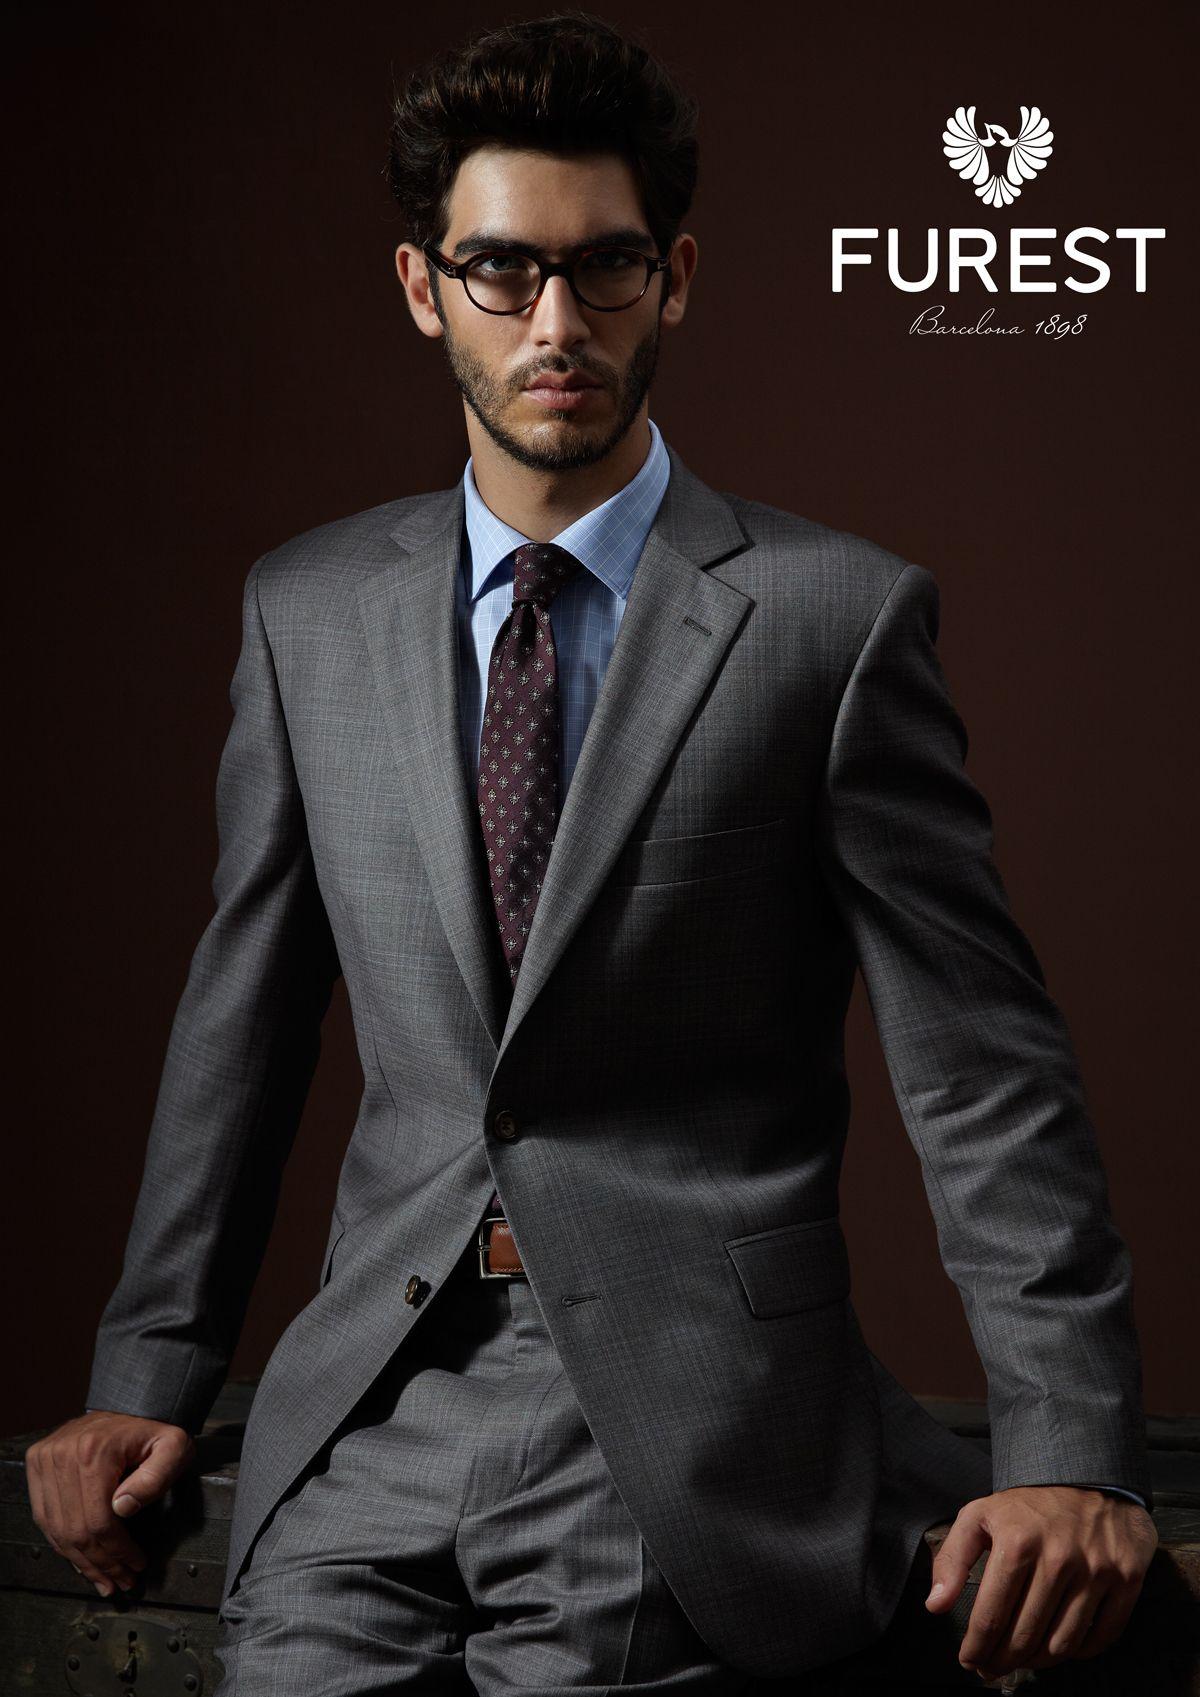 AW13 Trajes Furest Colección. trajes